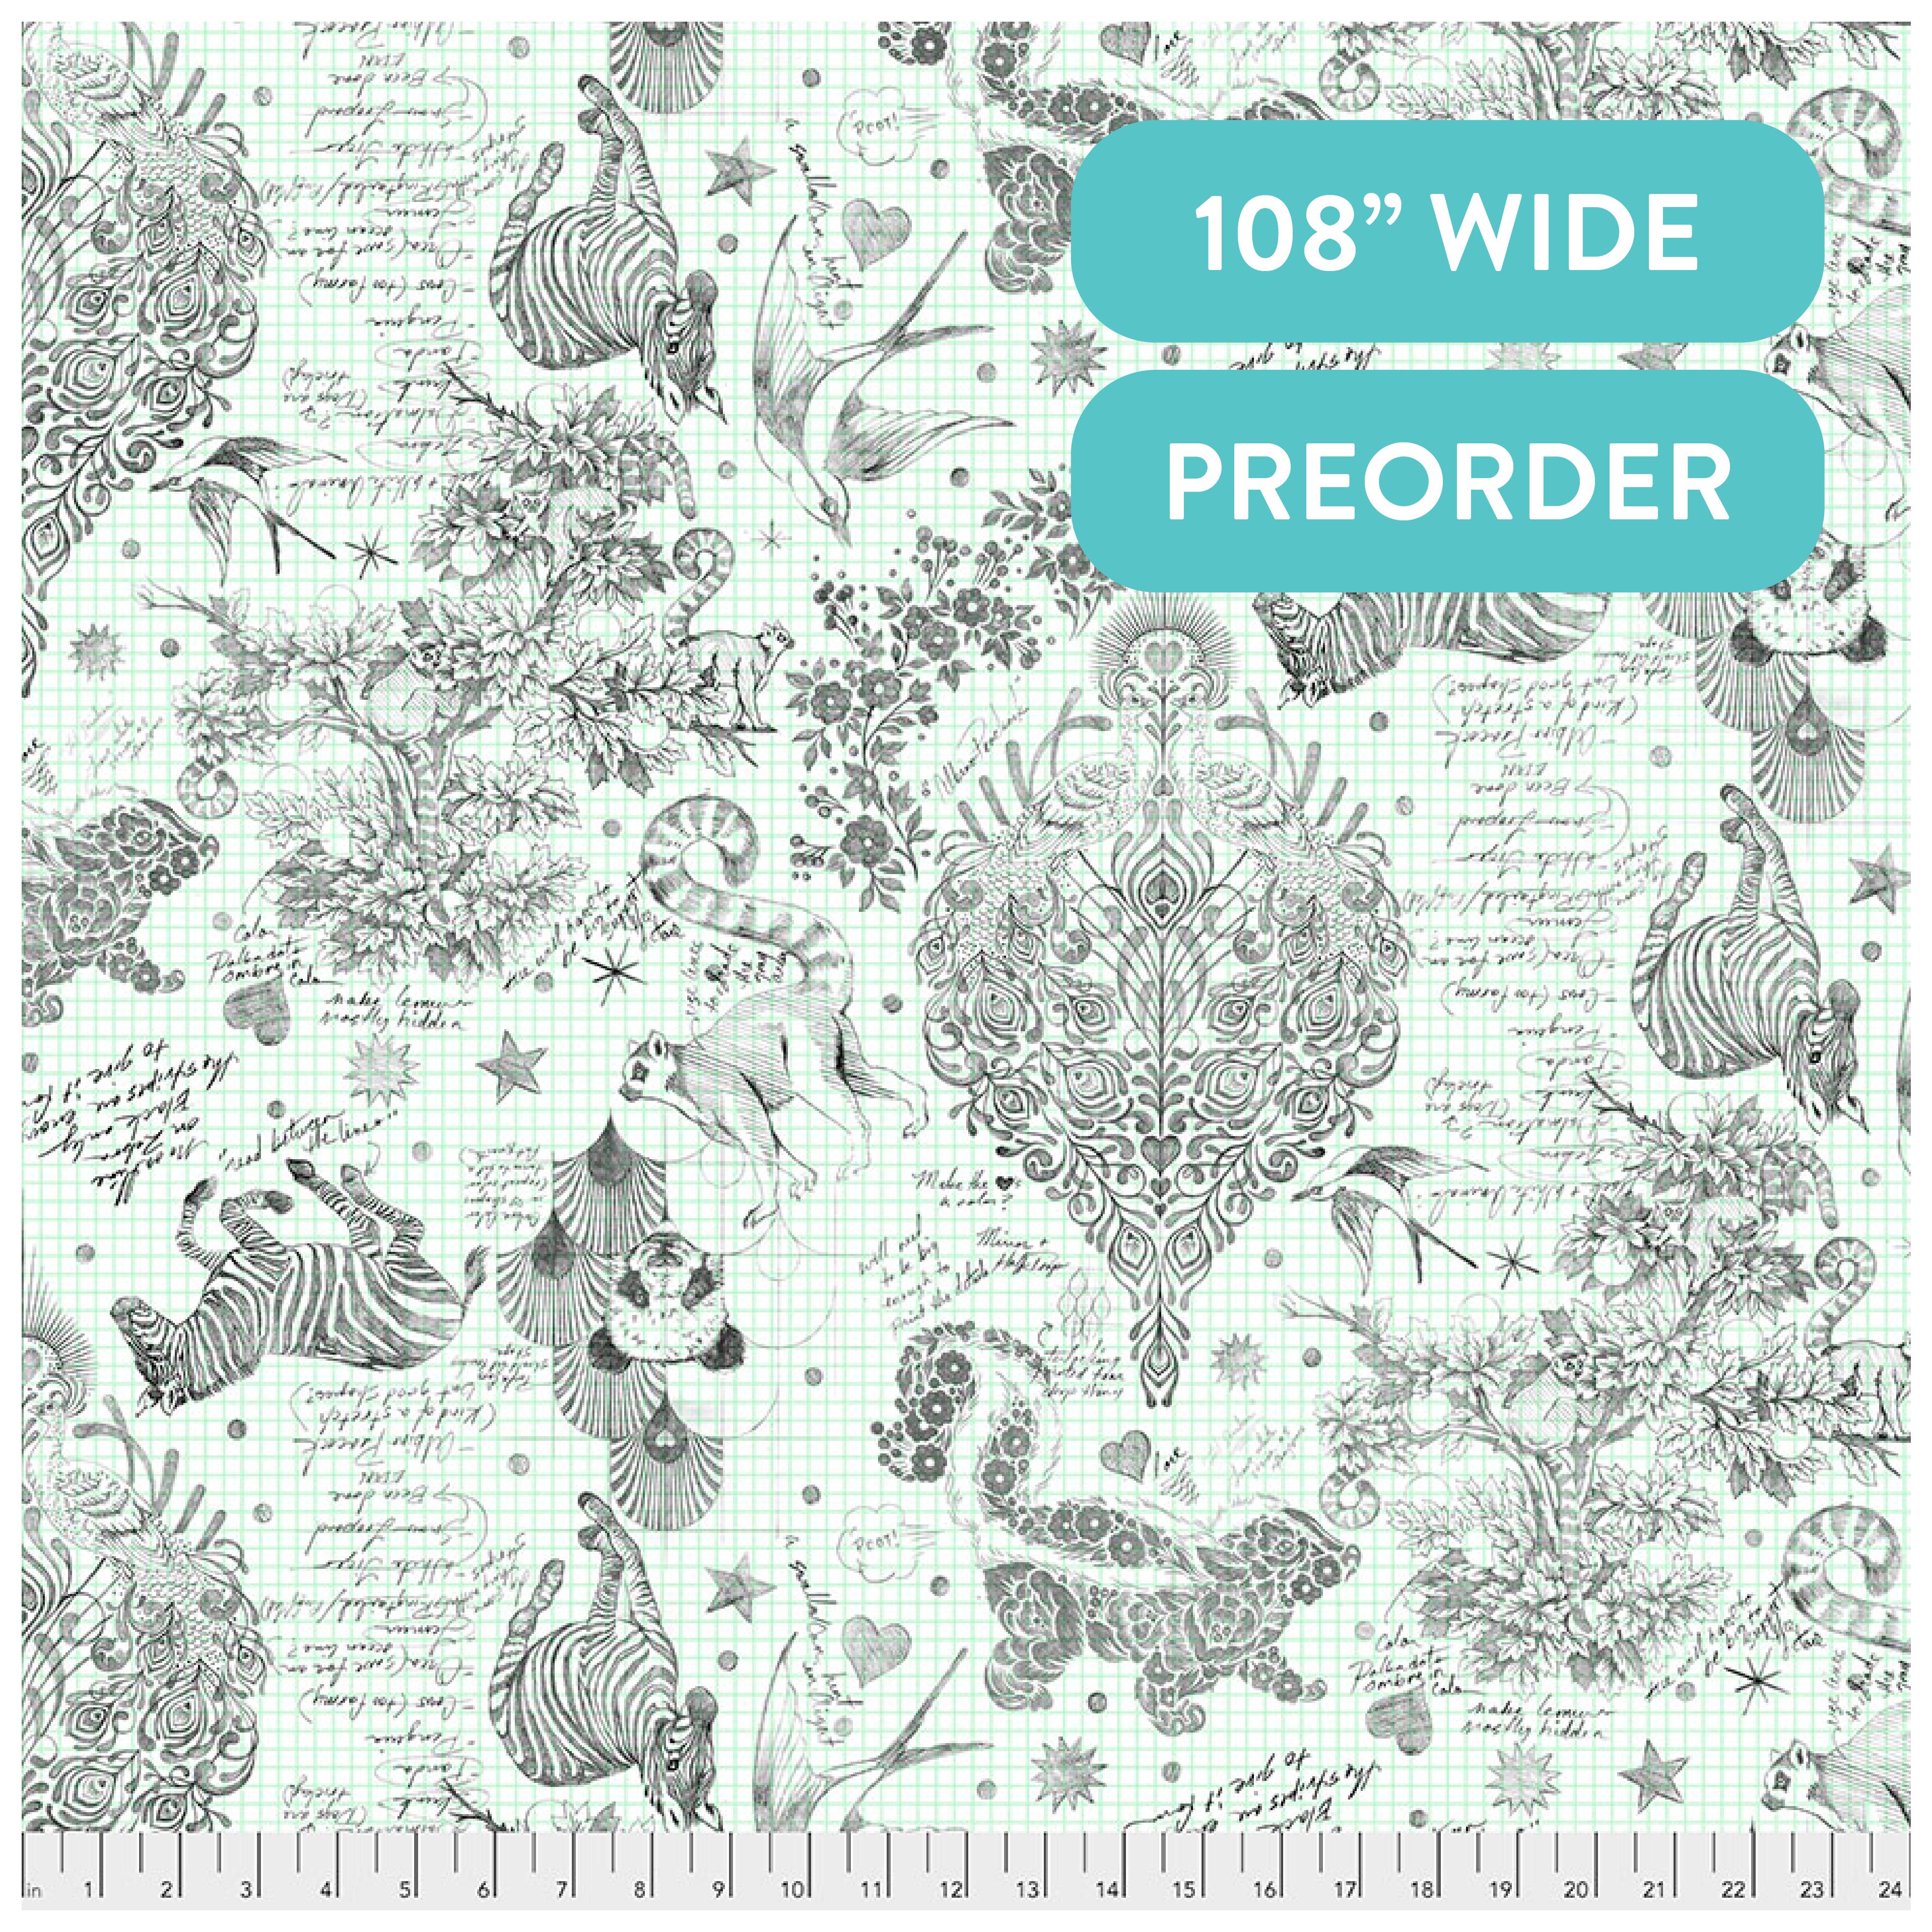 PREORDER Linework | Sketchyer in Paper - Wideback